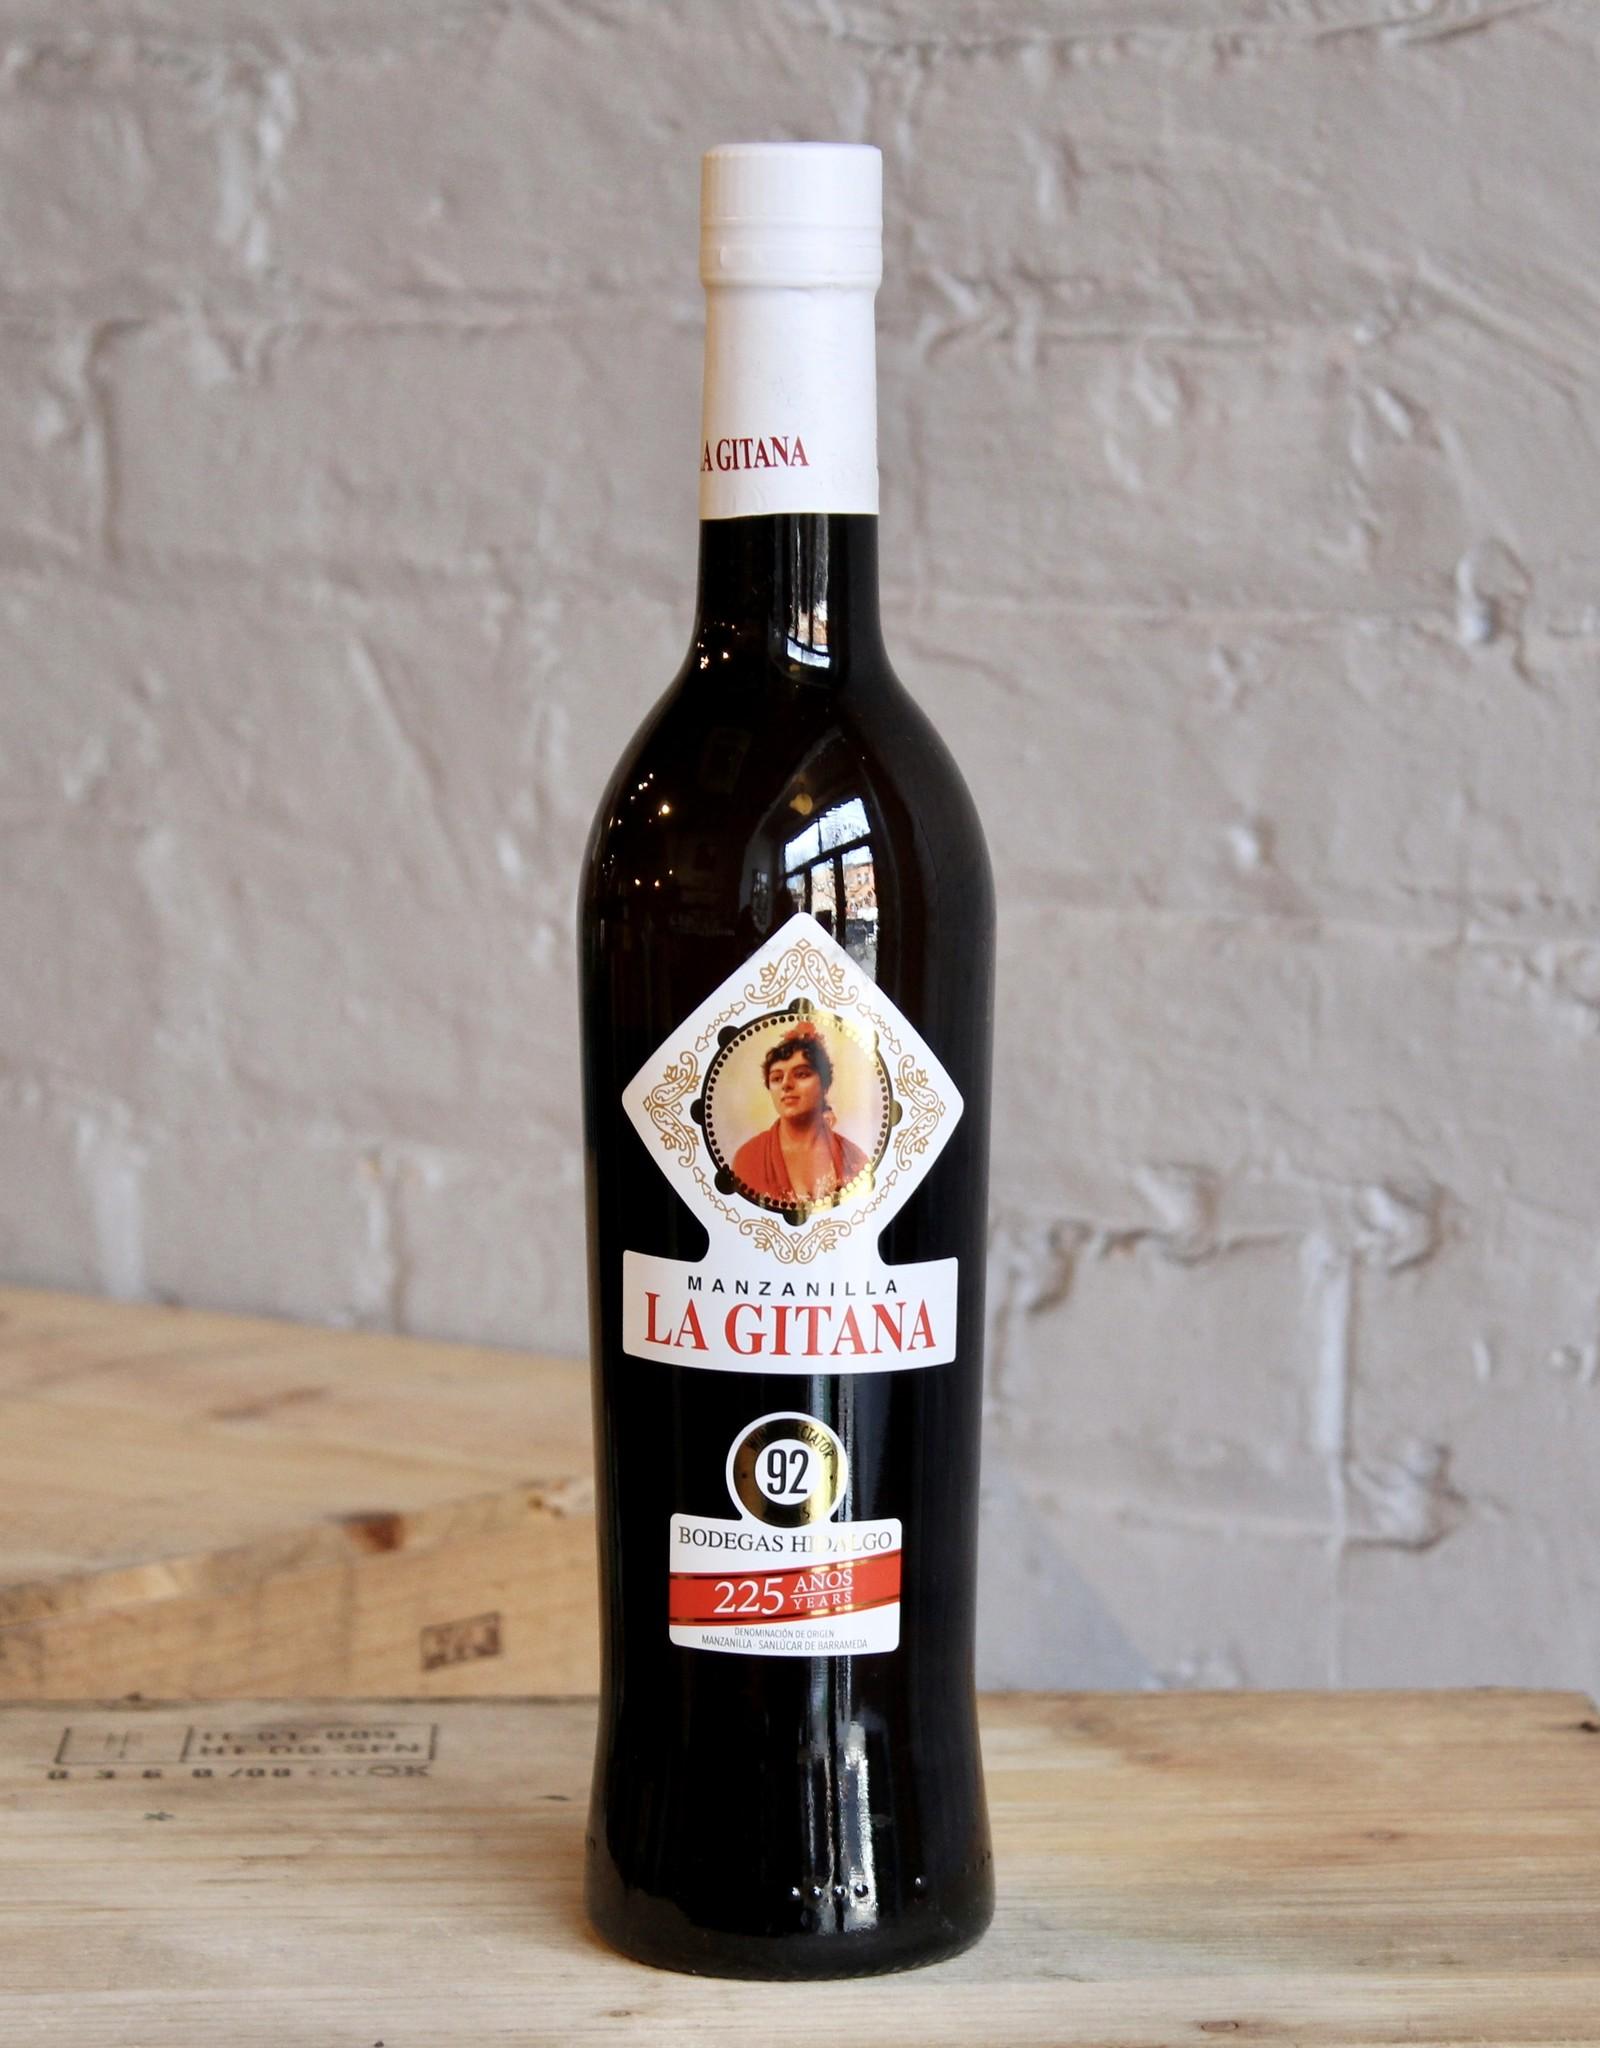 Wine NV Bodegas Hidalgo La Gitana, Manzanilla Sanlucar de Barrameda Sherry - Jerez, Spain (500ml)